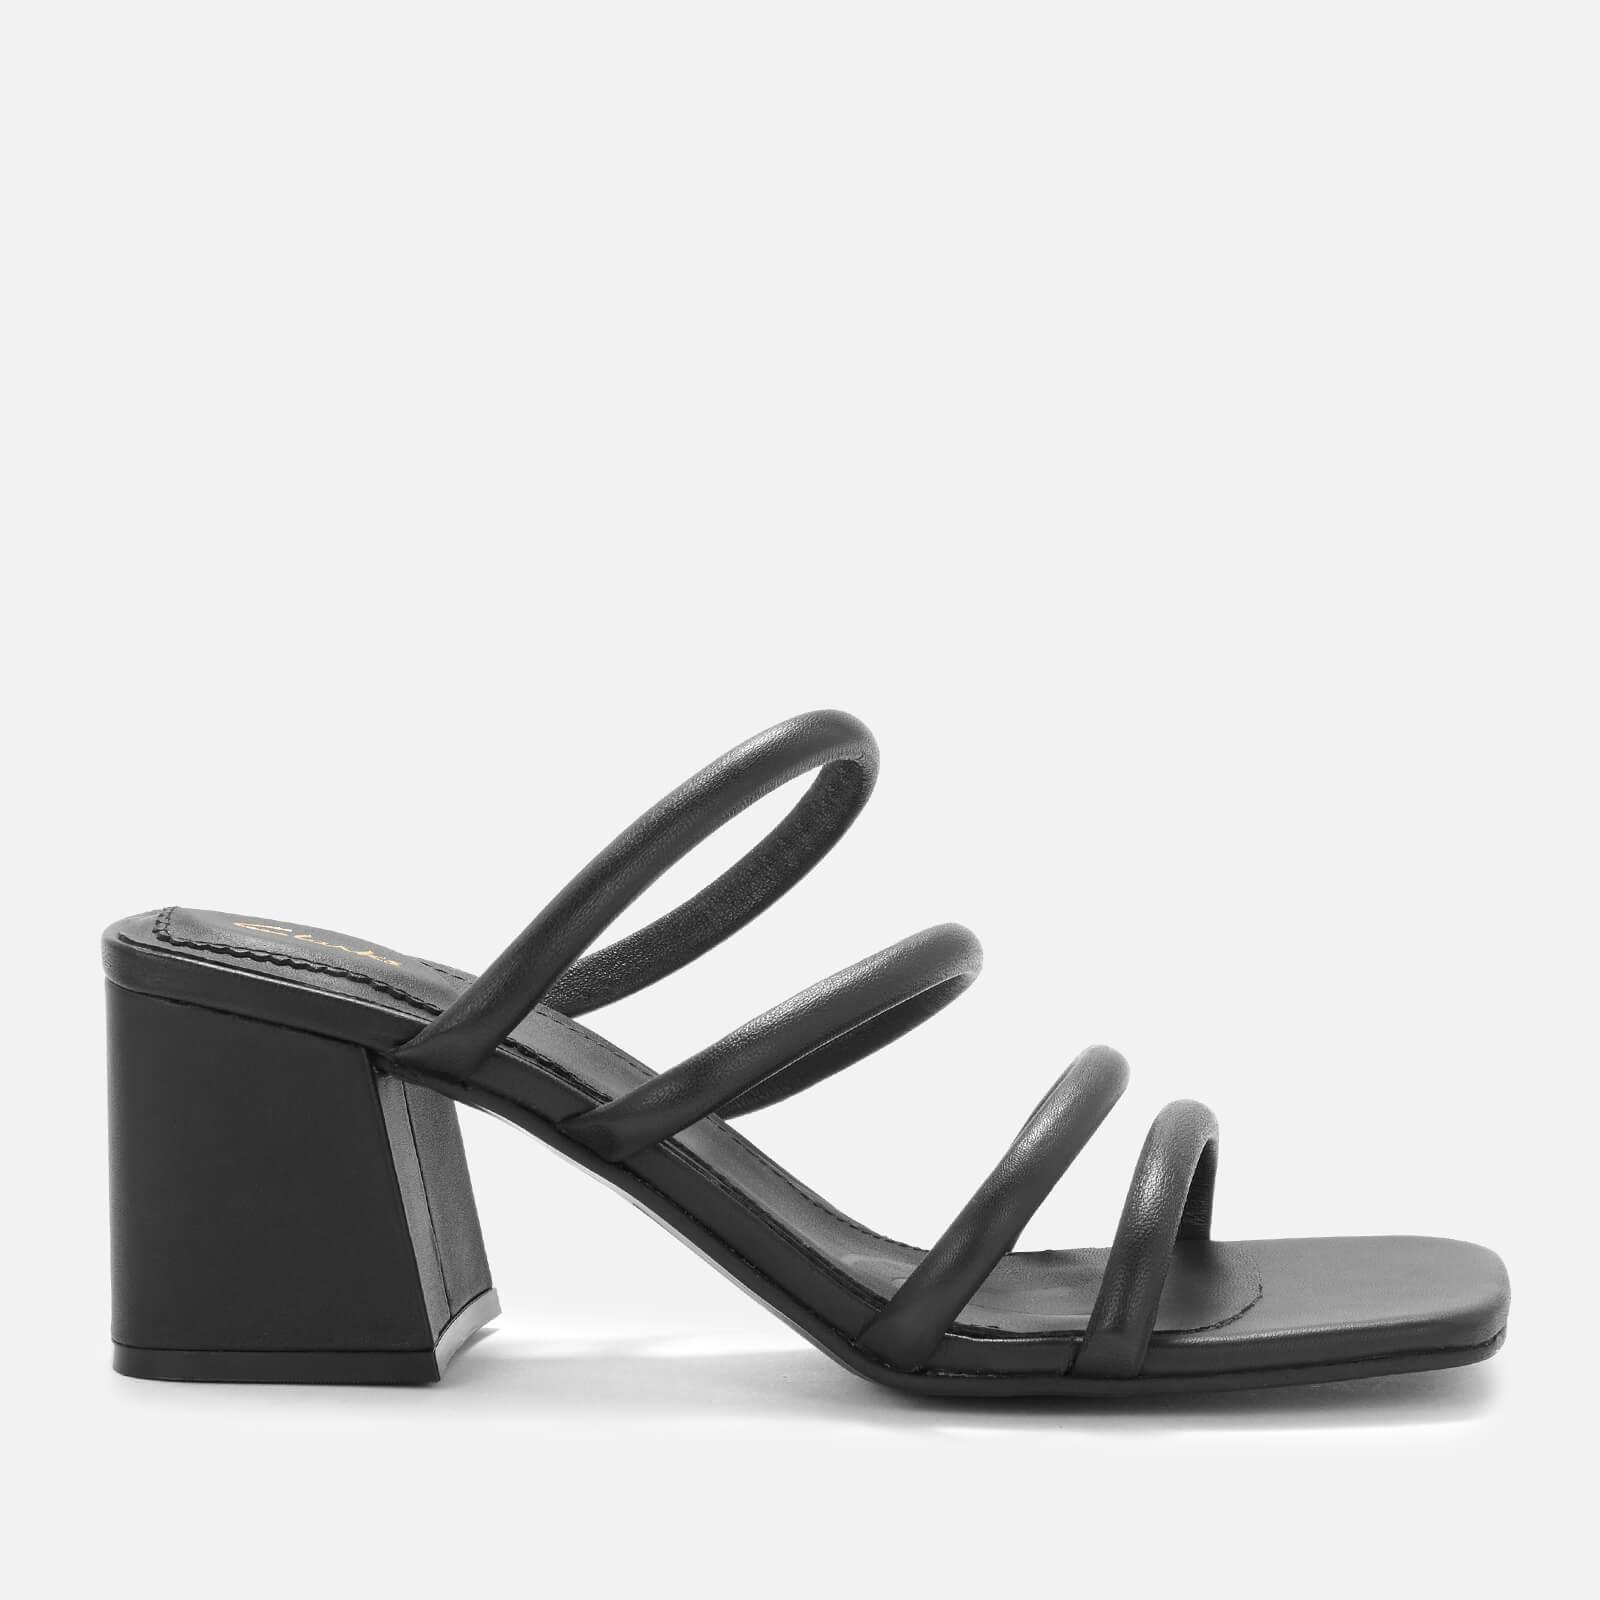 Clarks Women's Sheer65 Leather Heeled Mules - Black - Uk 3